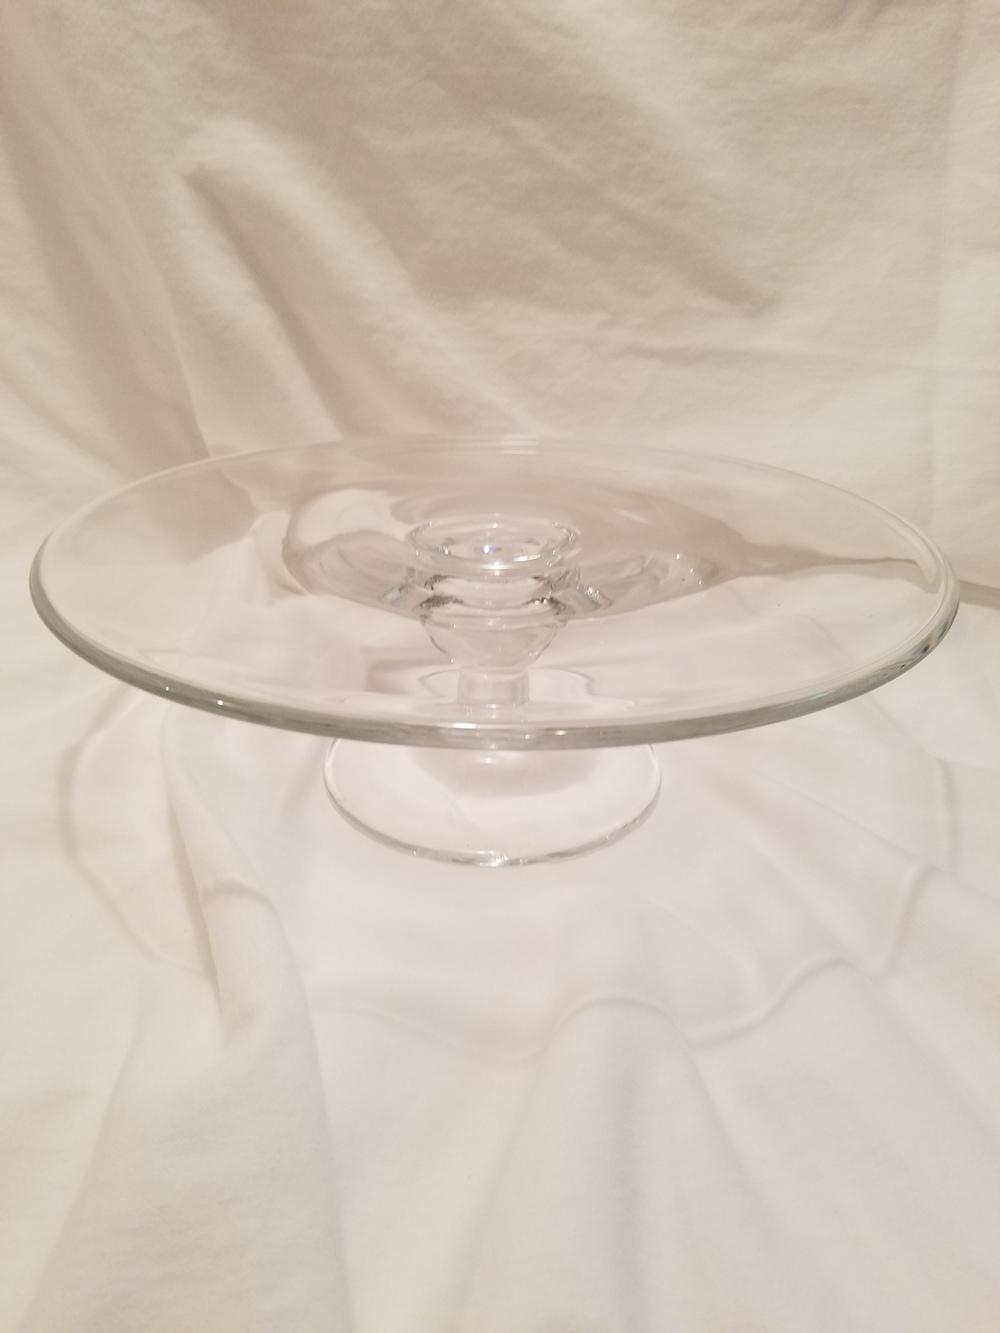 Lenox glass cake stand